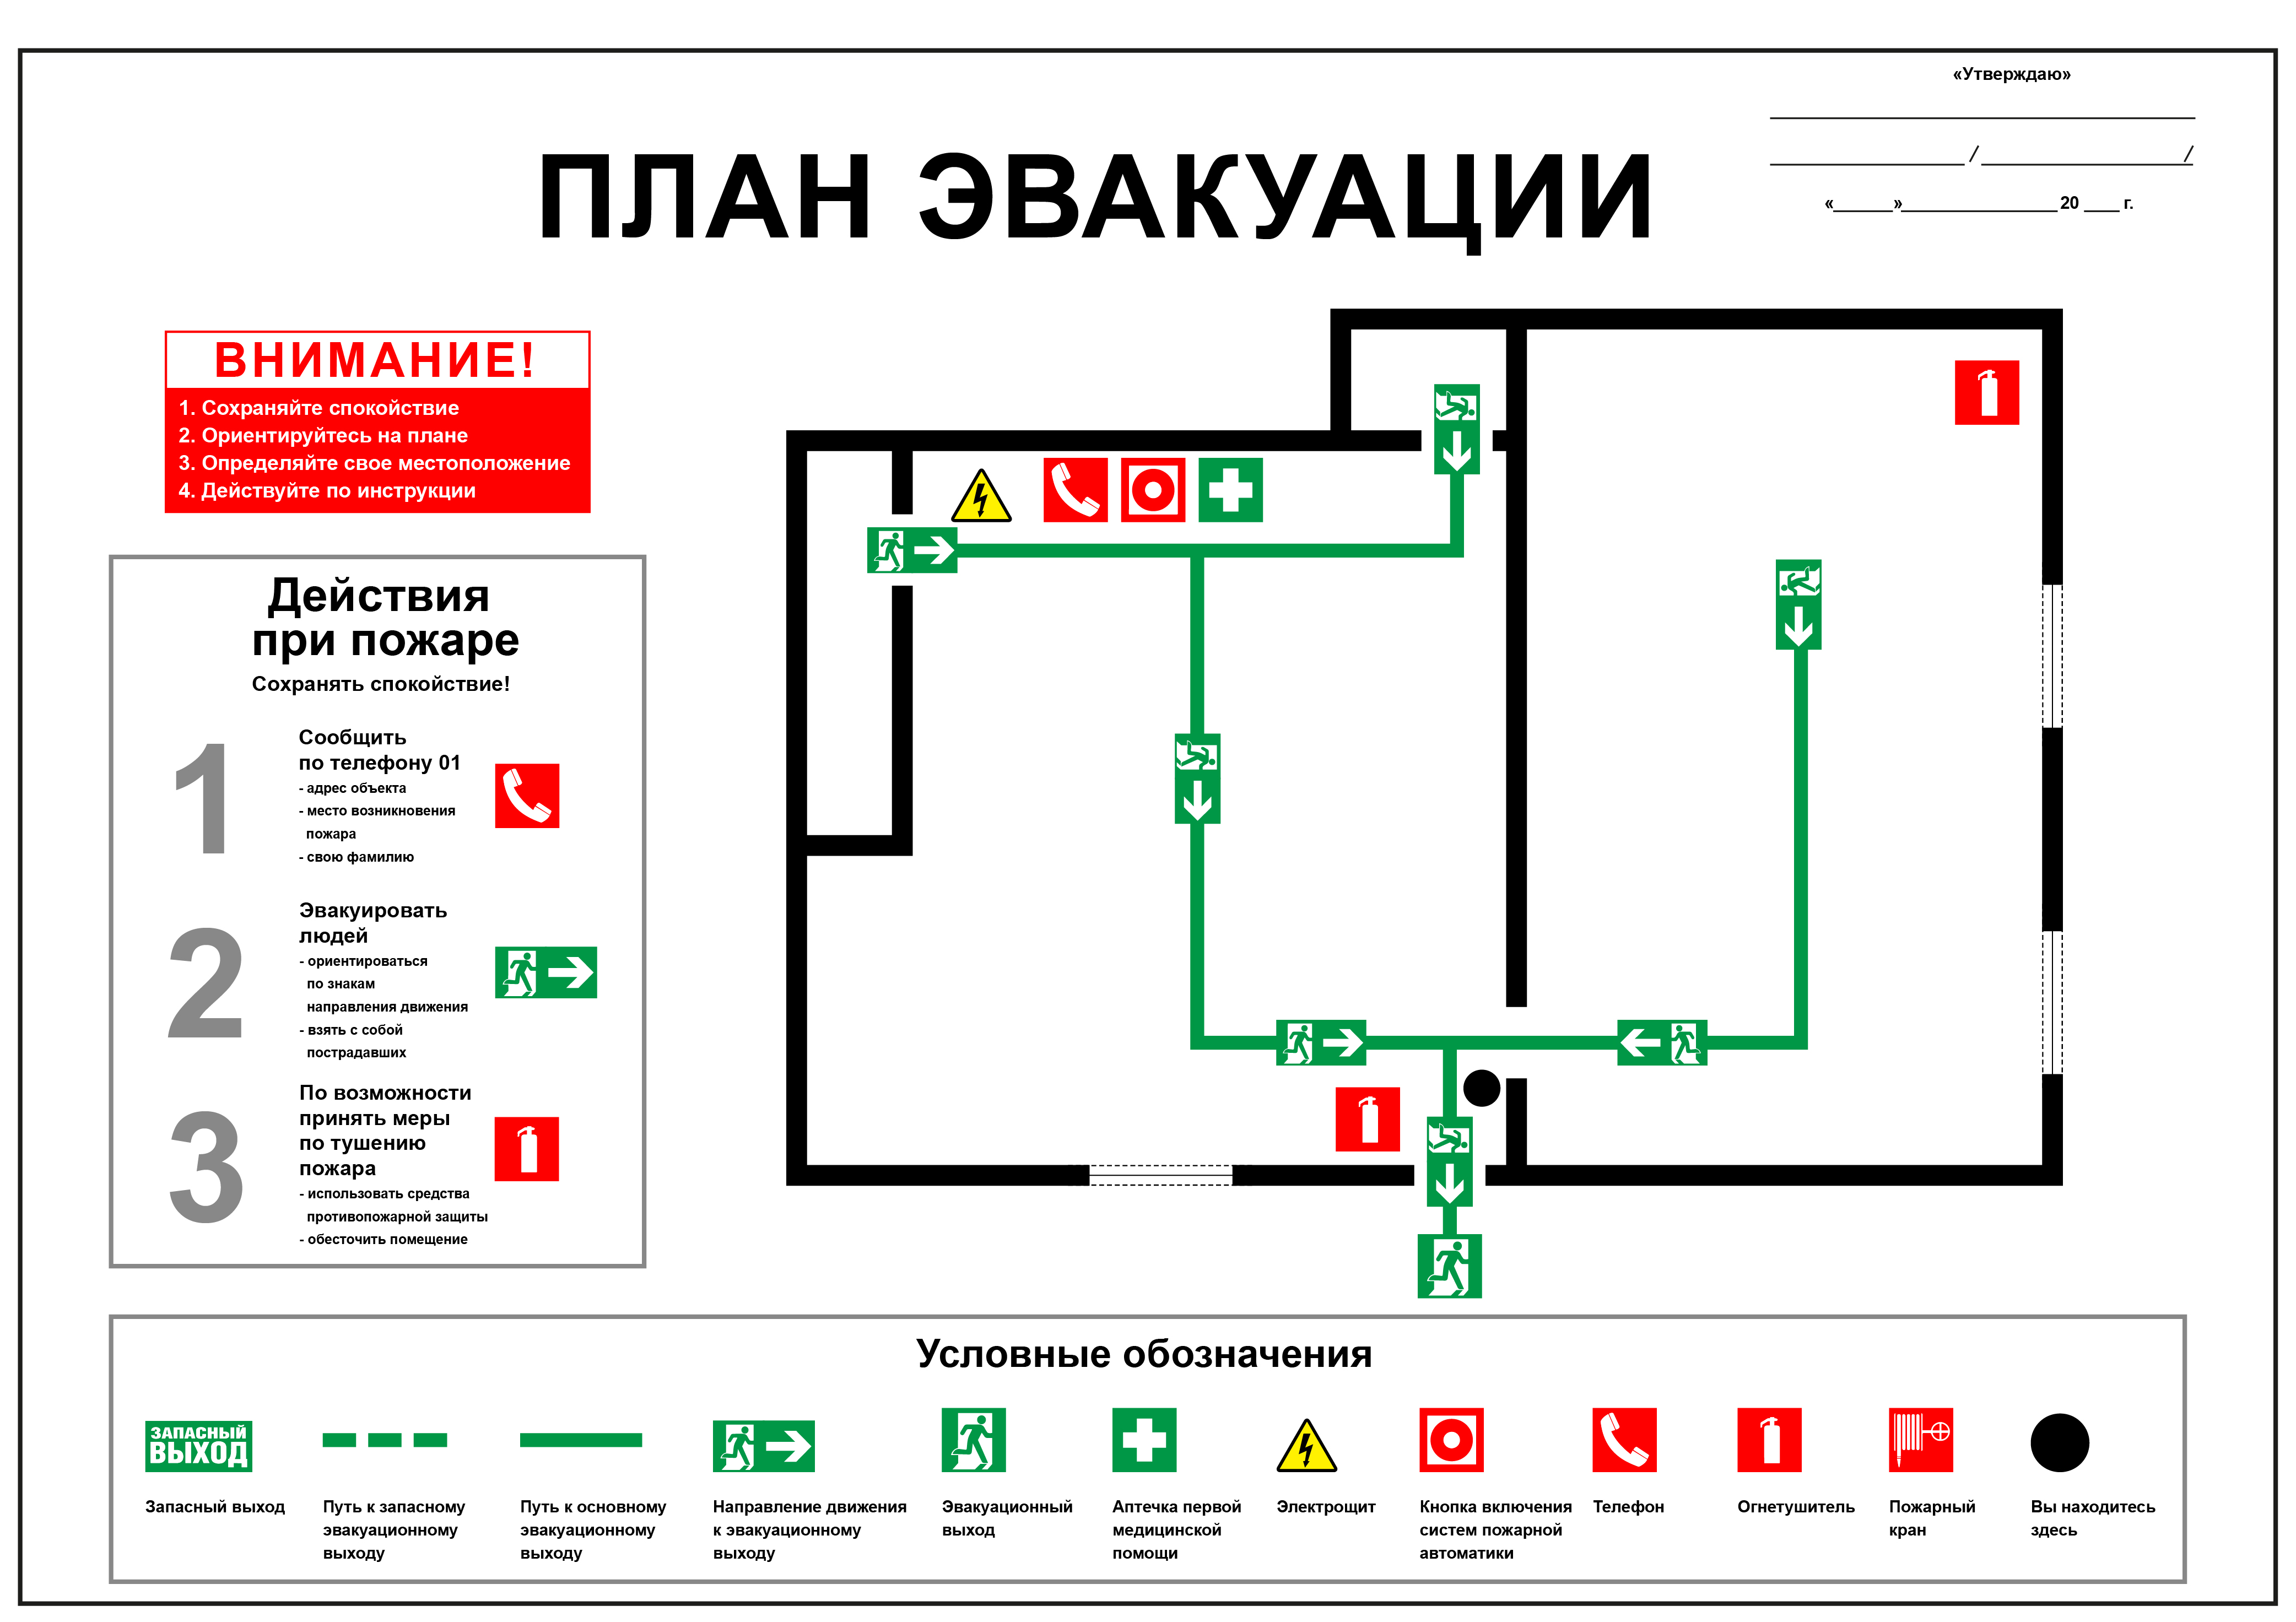 https://clubtk.ru/fls/15105/plan-evakuatsii-maks.jpg